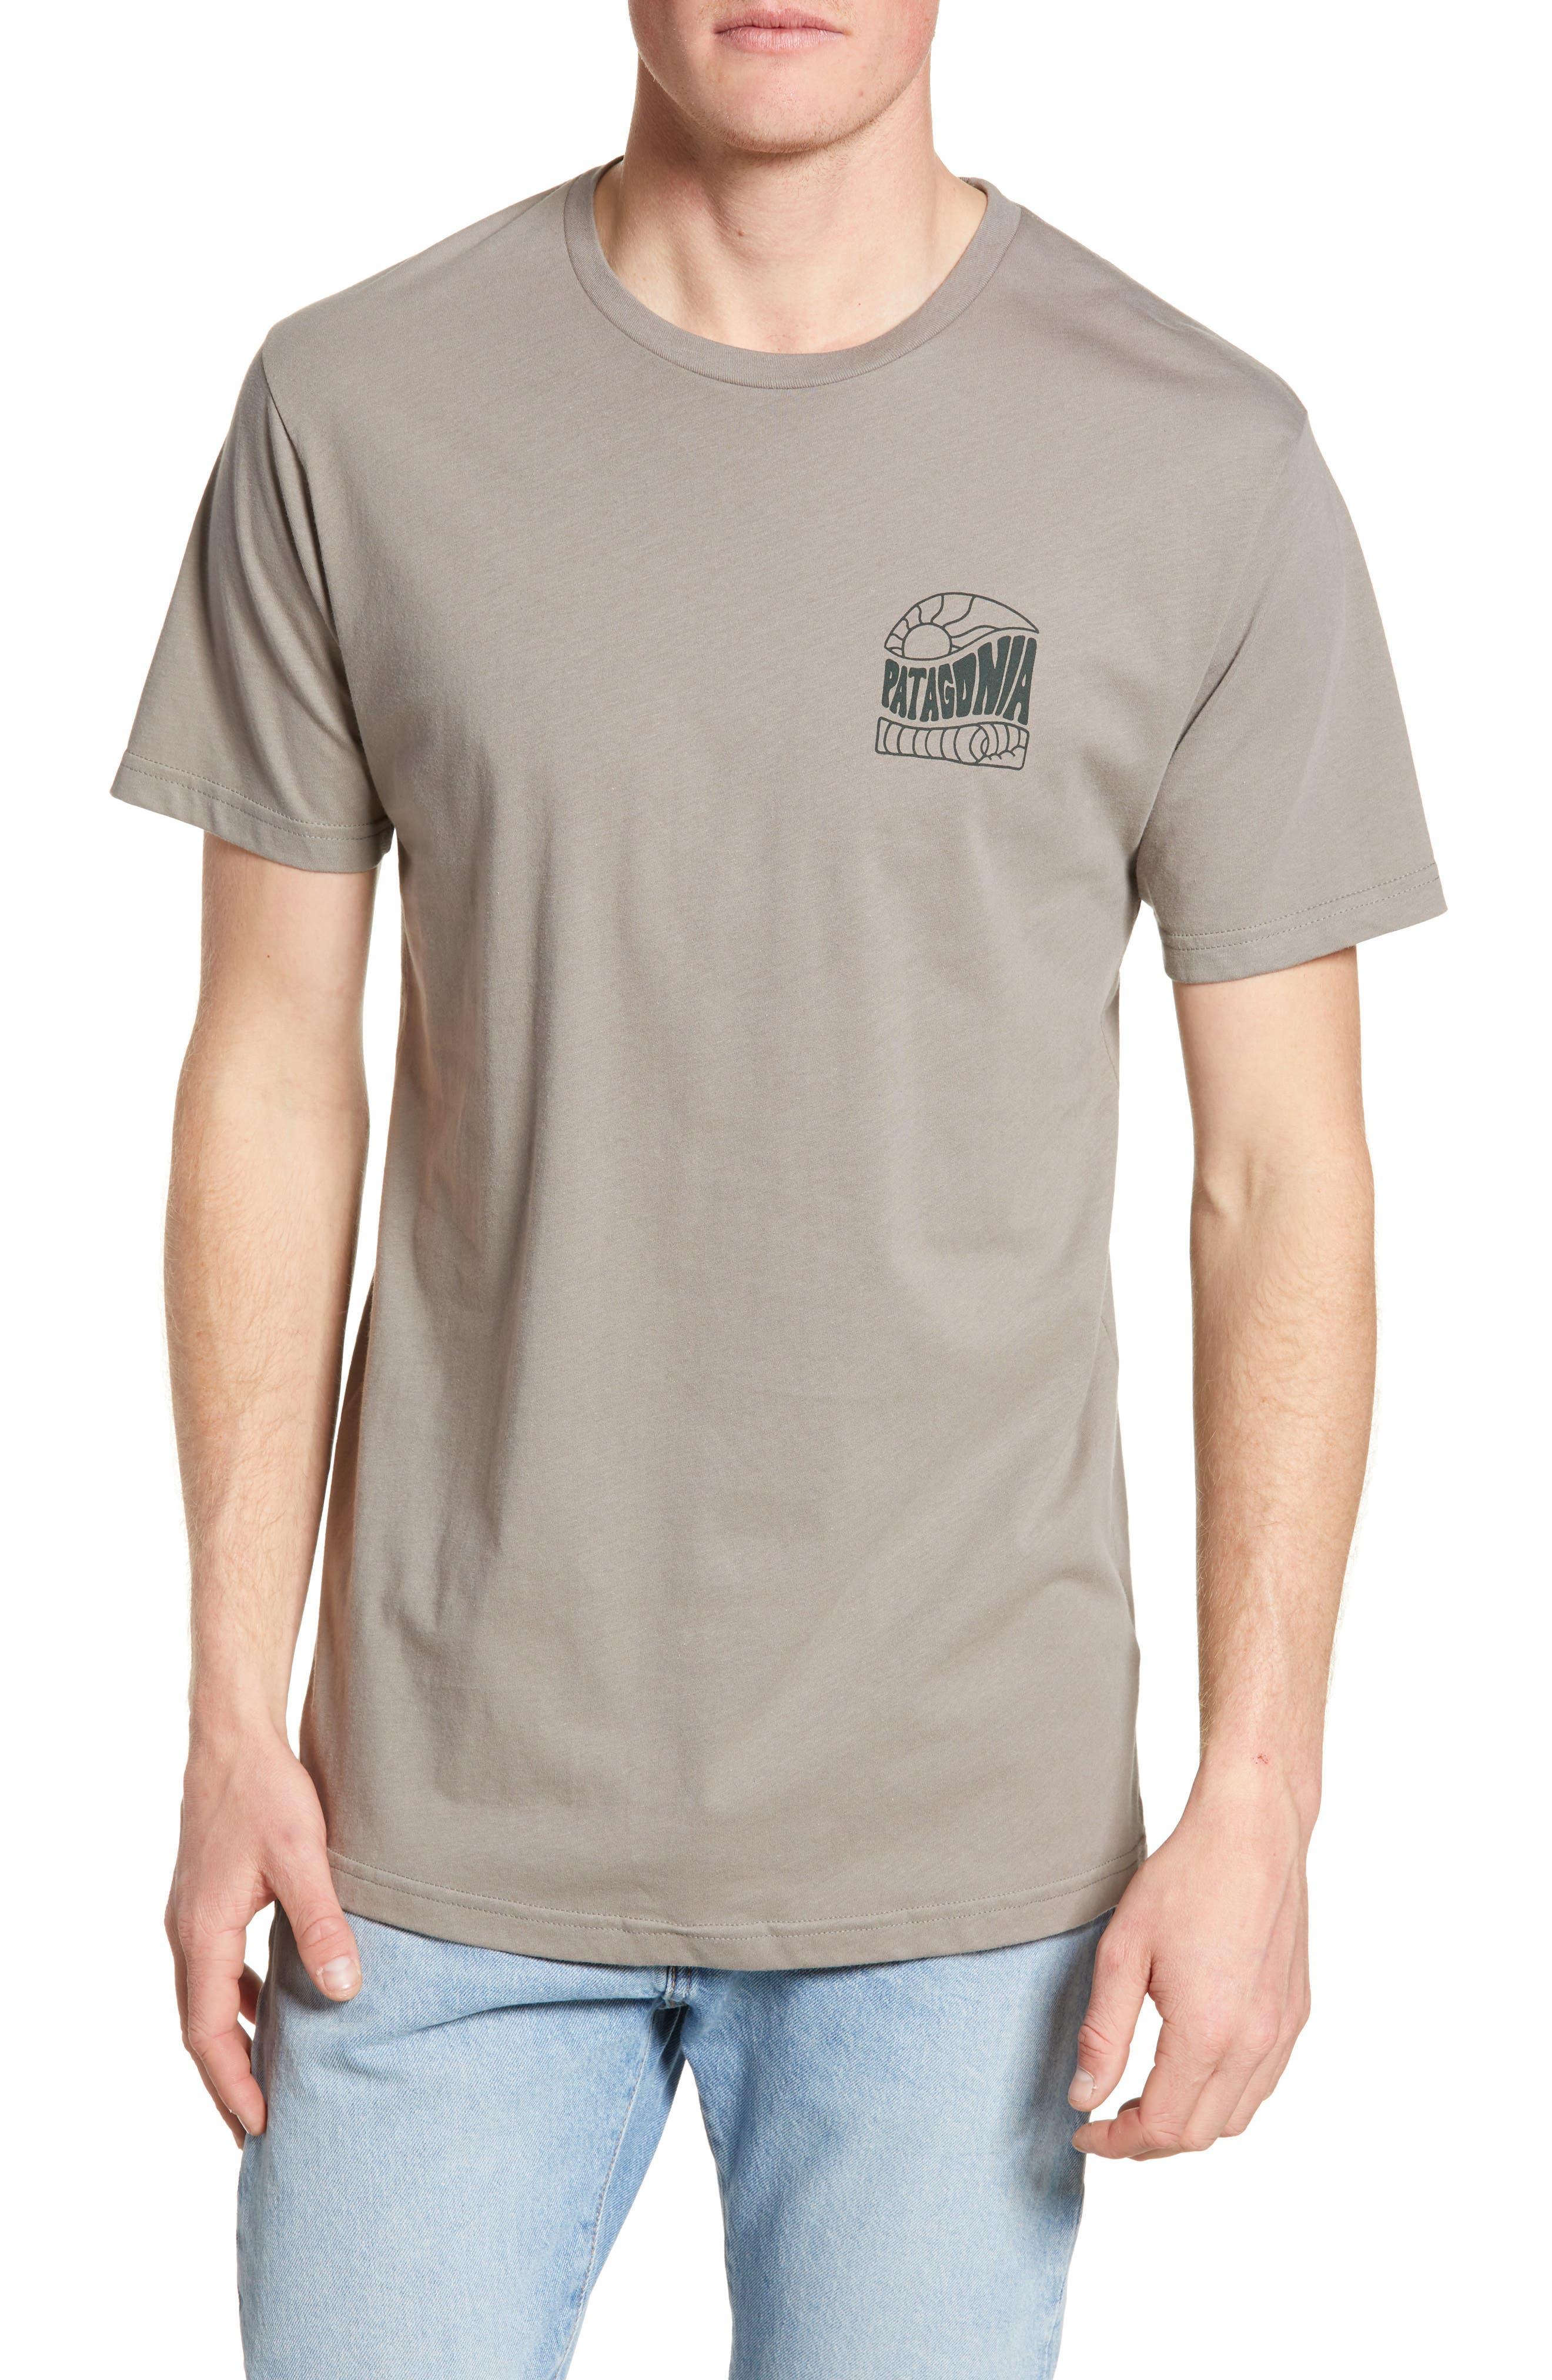 Patagonia Cosmic Peaks Graphic Organic Cotton T-Shirt, Grey